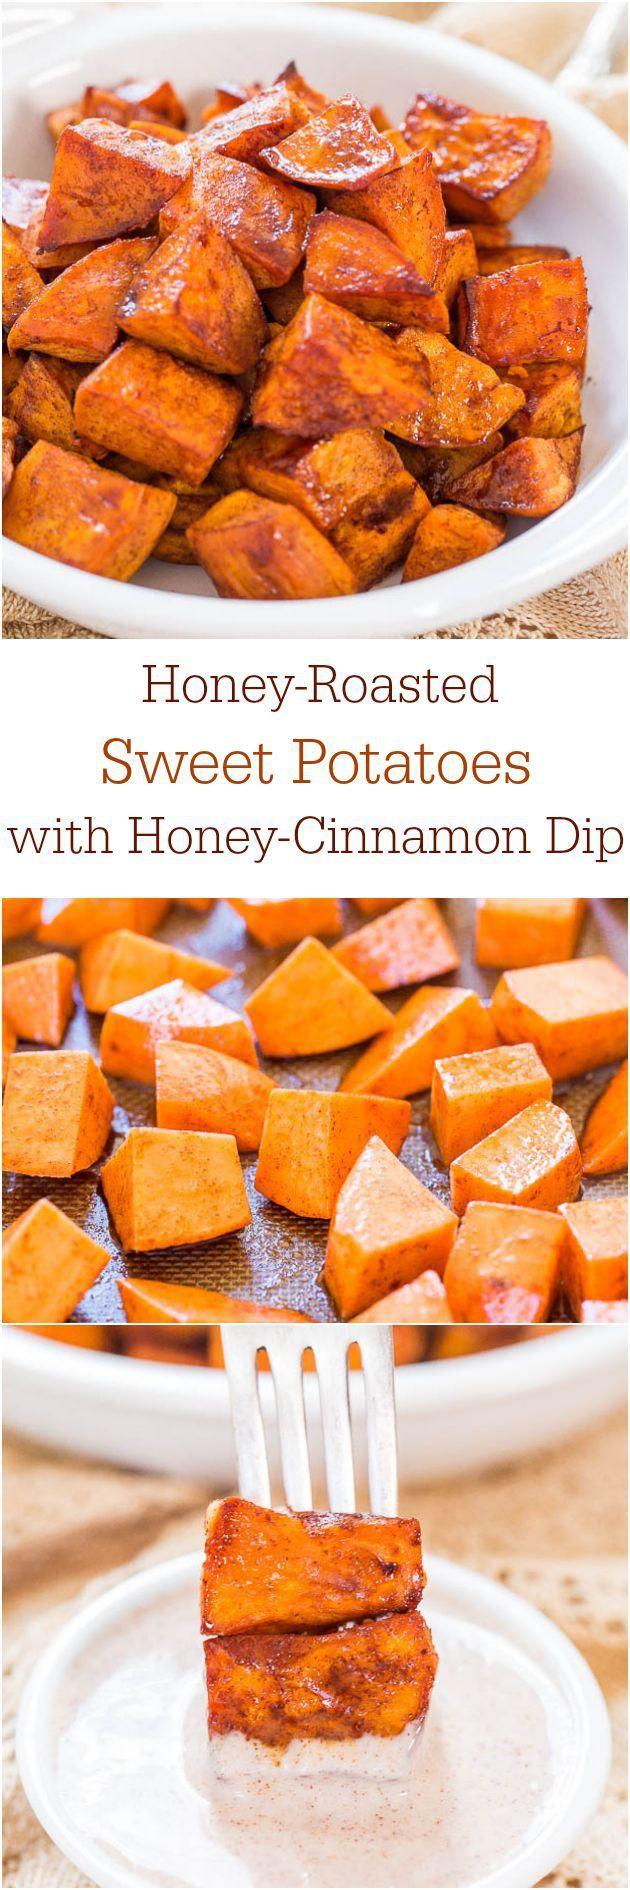 Honey-Roasted Sweet Potatoes with Honey-Cinnamon Dip